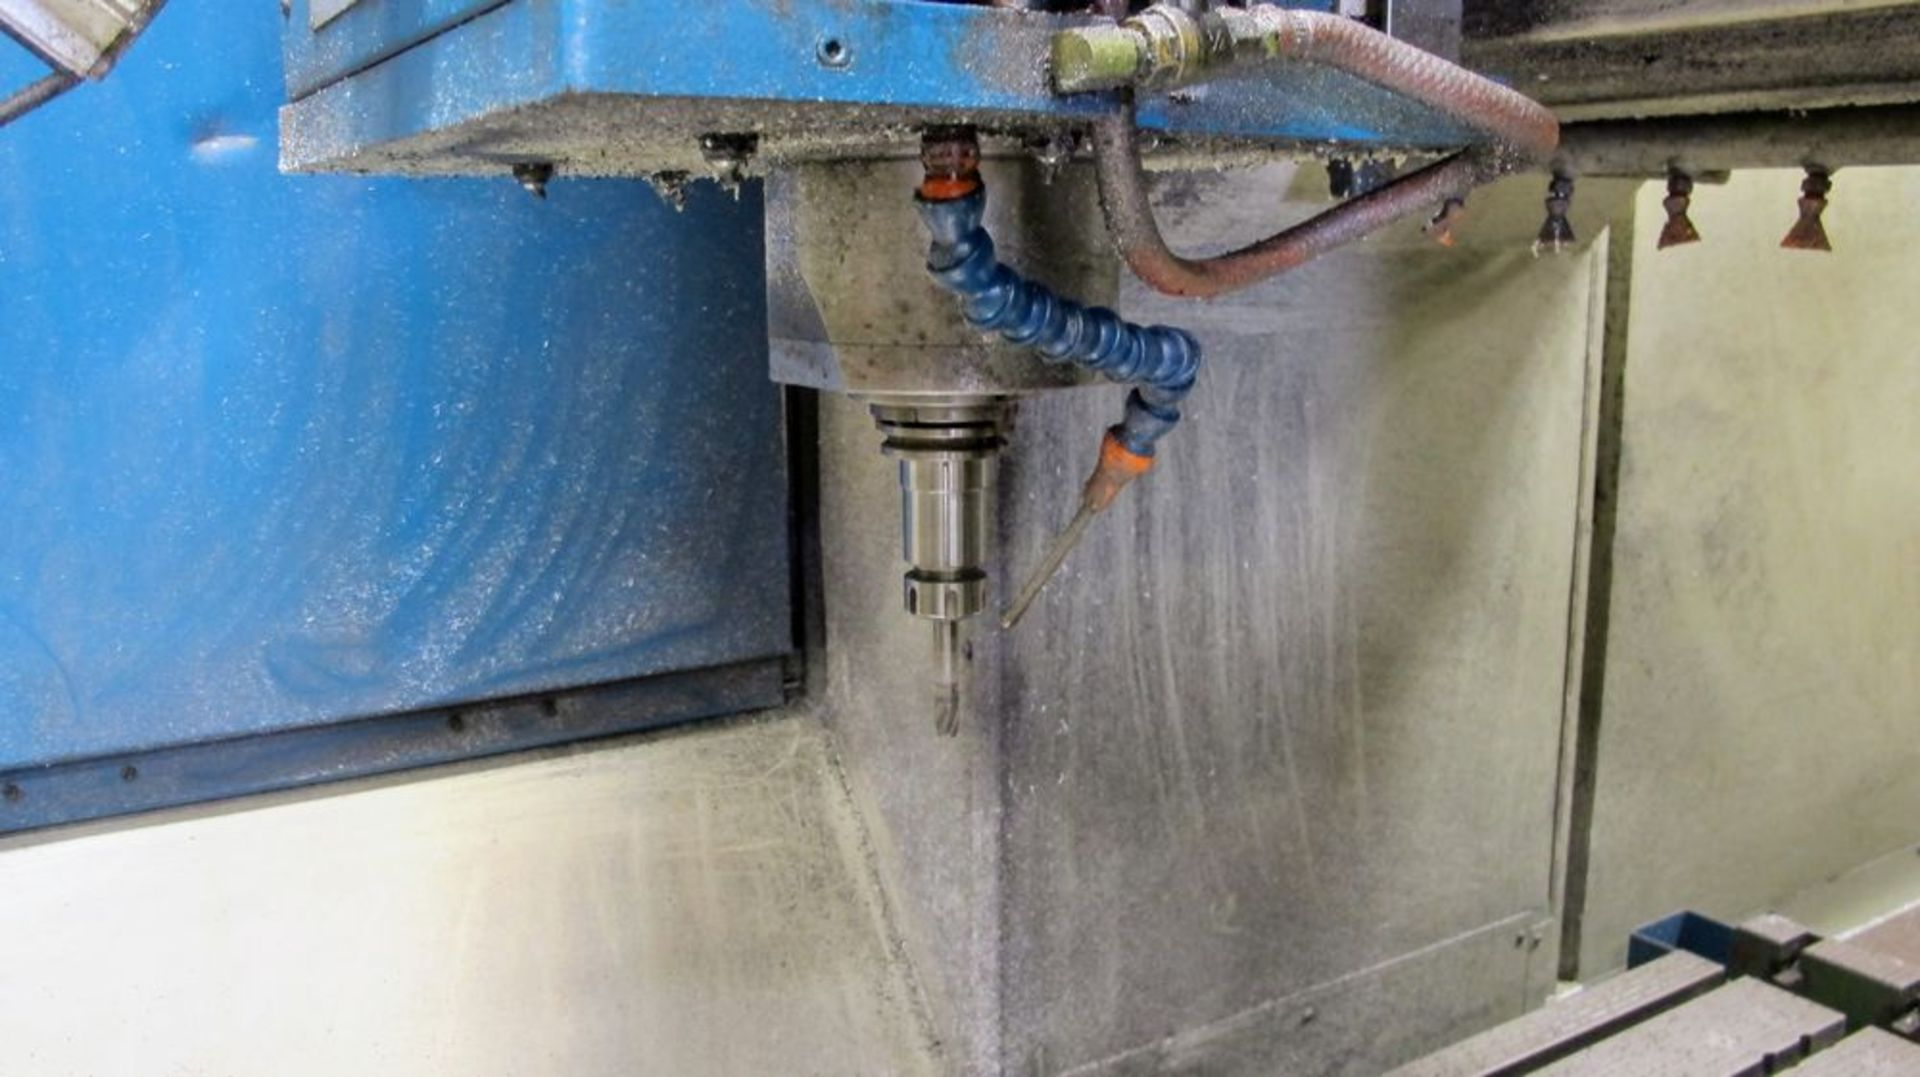 "Lot 49 - 2001 NICOLAS CORREA Euro-2.000 CNC Bridge Type Vertical Machining Center, s/n 900054, 40"" x 80"""